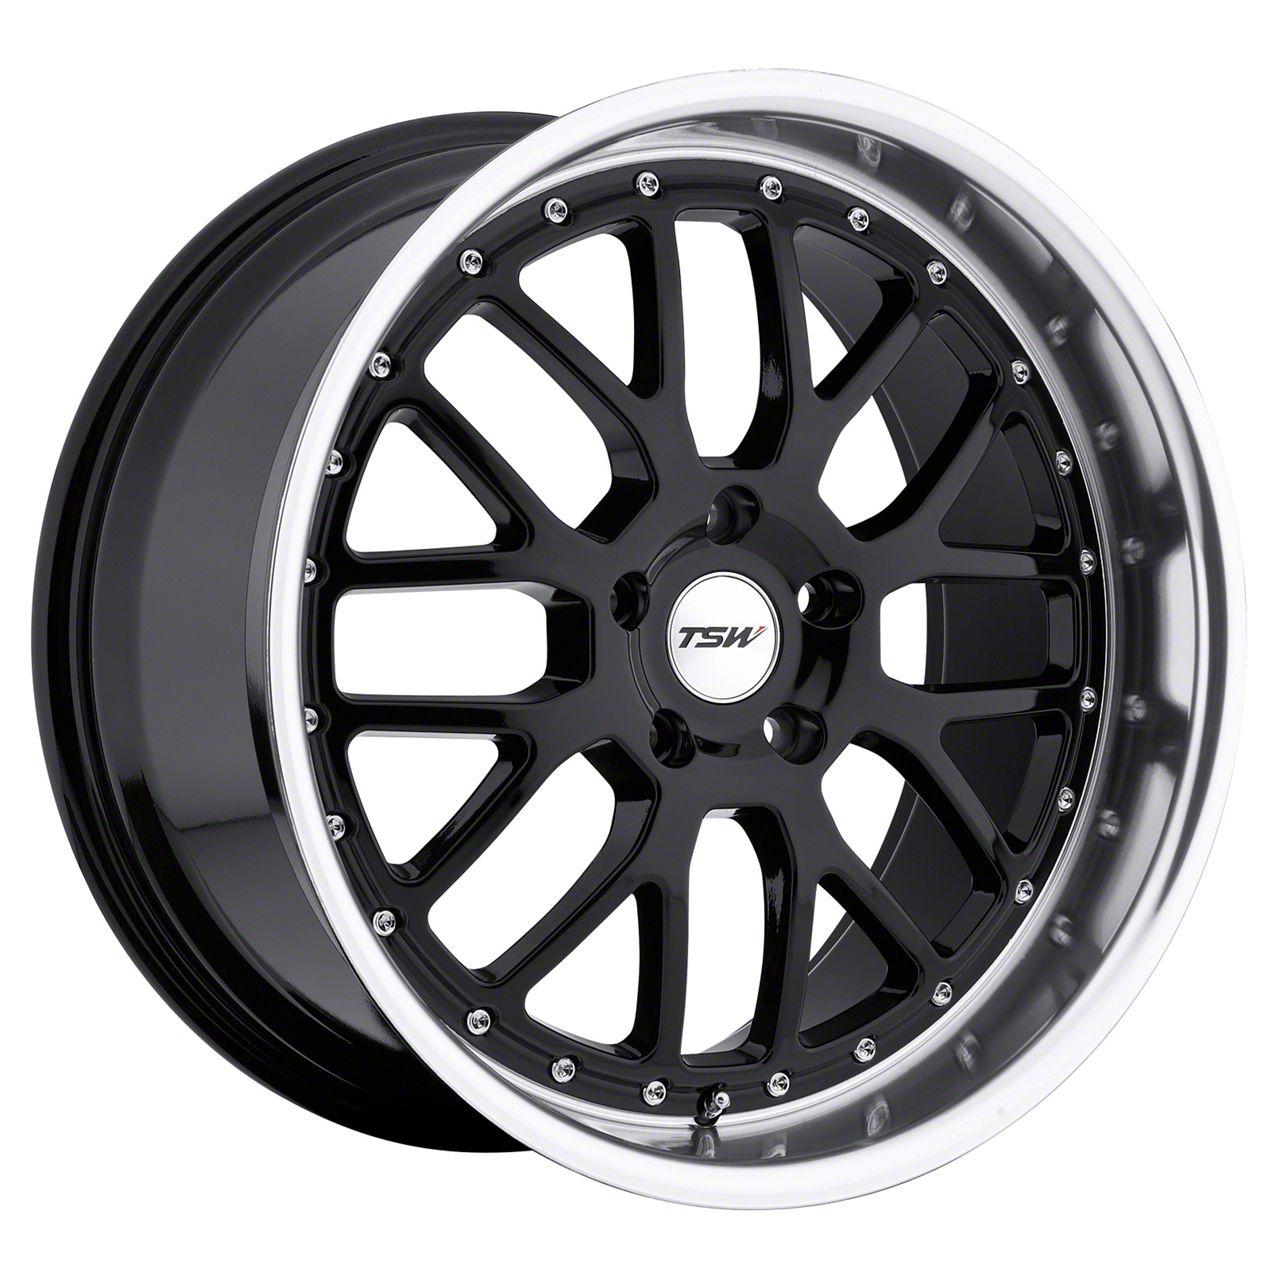 TSW Valencia Gloss Black w/ Mirror Cut Lip Wheel - 20x10 (05-14 All)